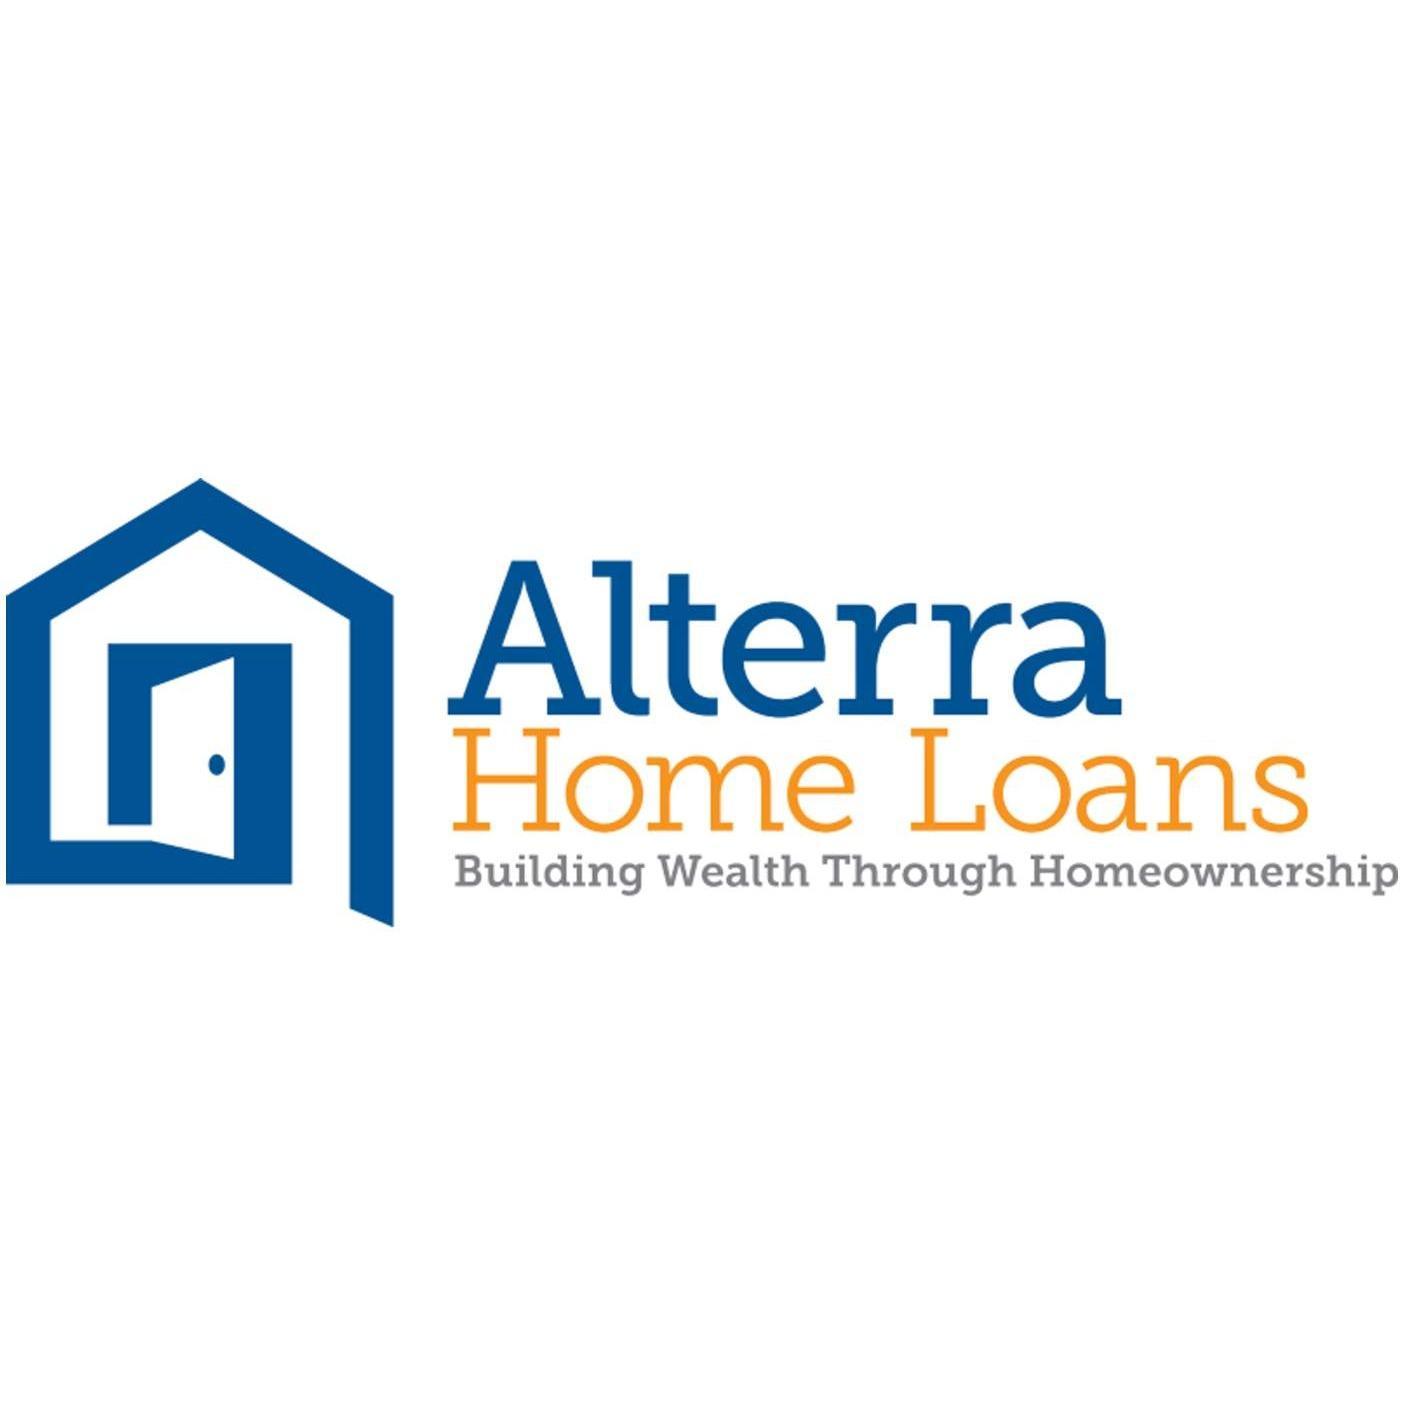 Orlando Diaz, Alterra Home Loans - NMLS 443417 image 0